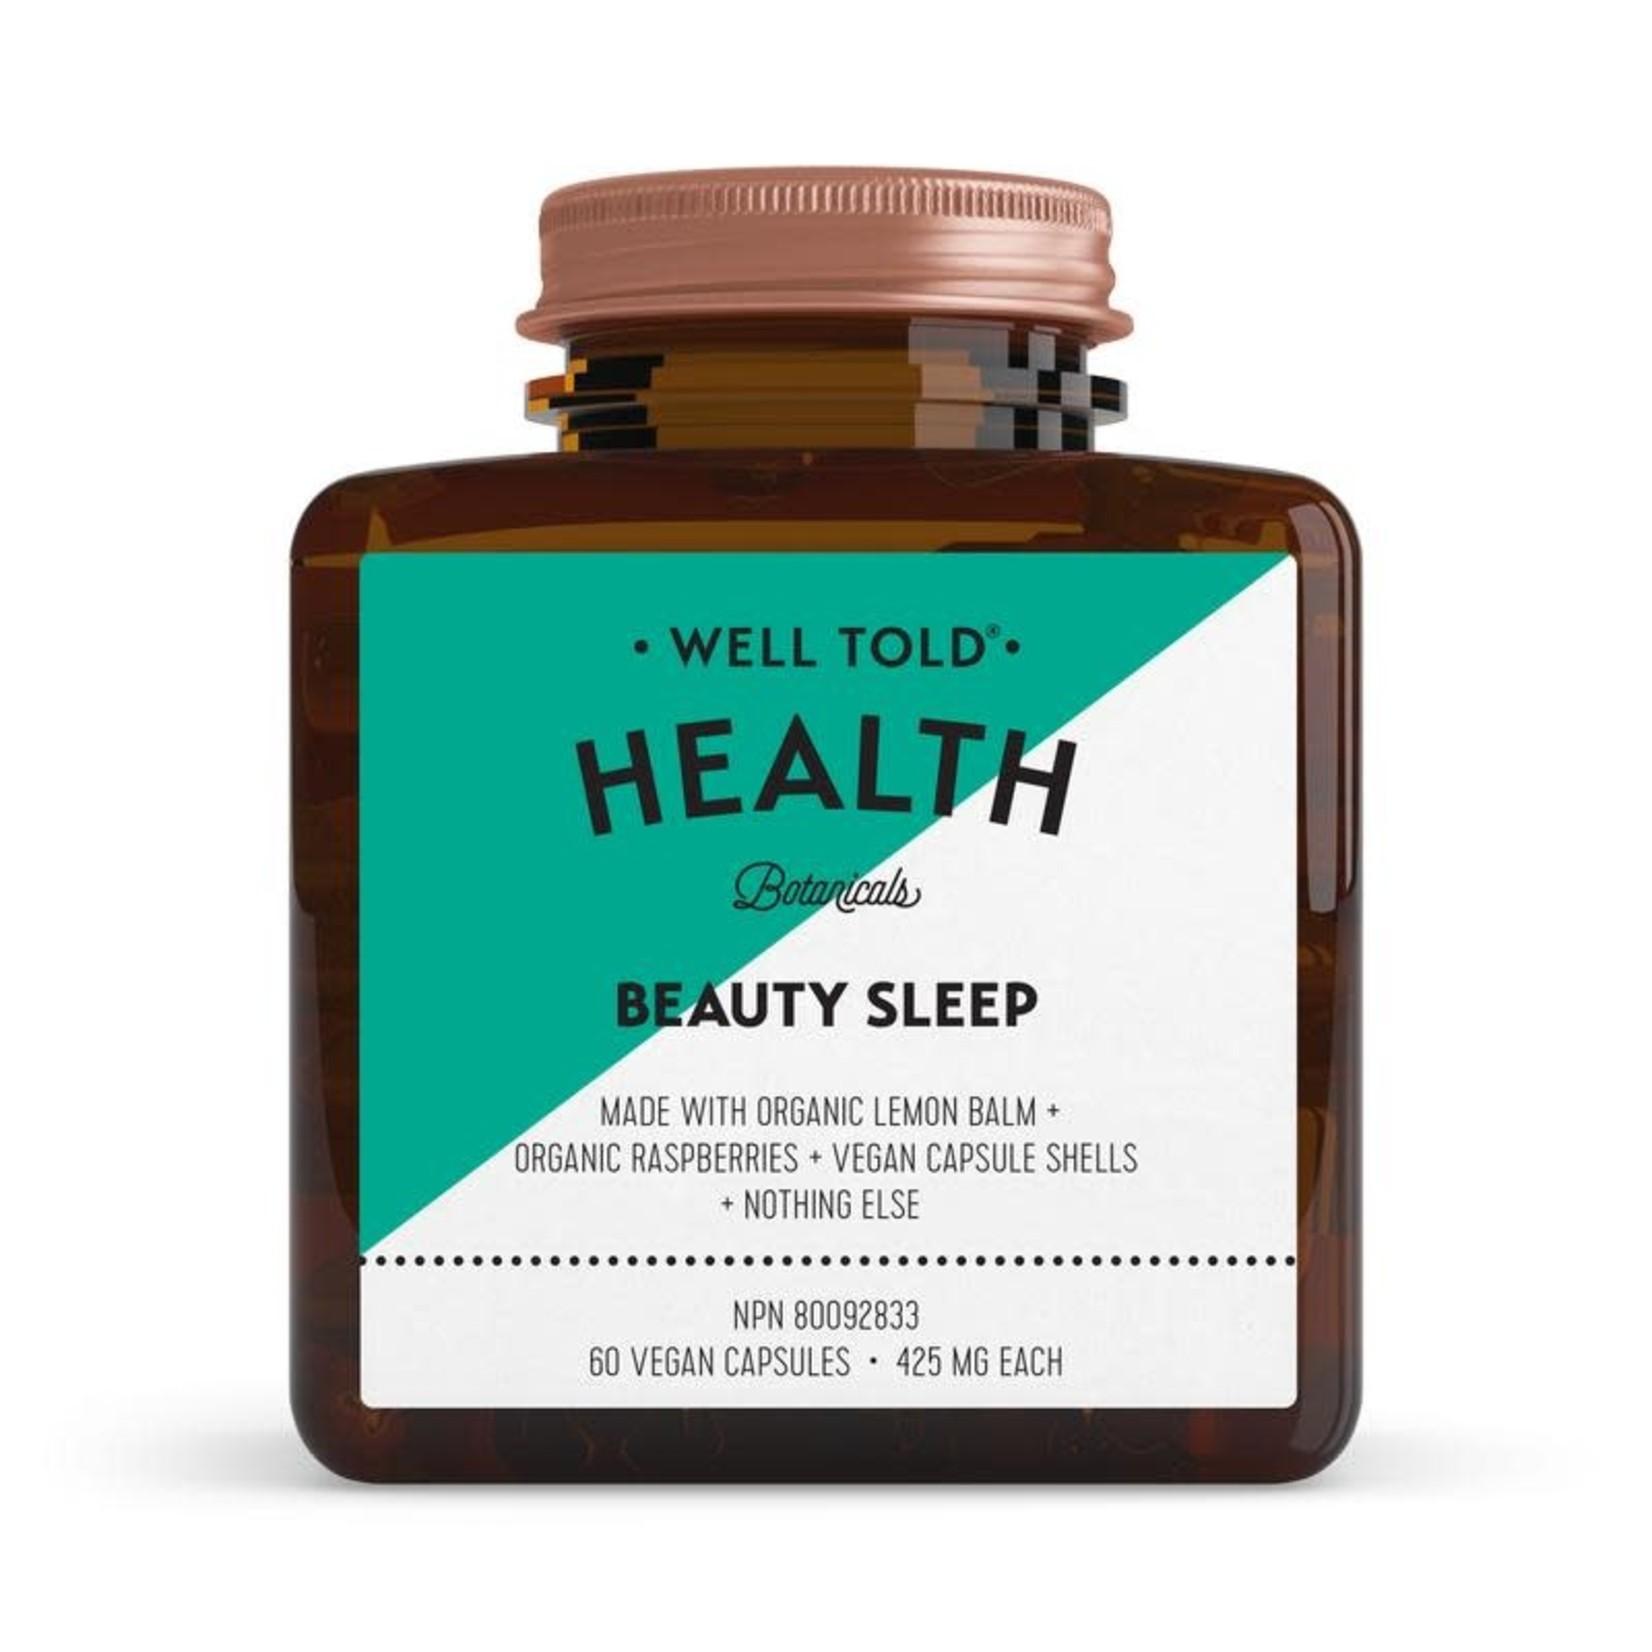 WELL TOLD HEALTH BOTANICALS BEAUTY SLEEP